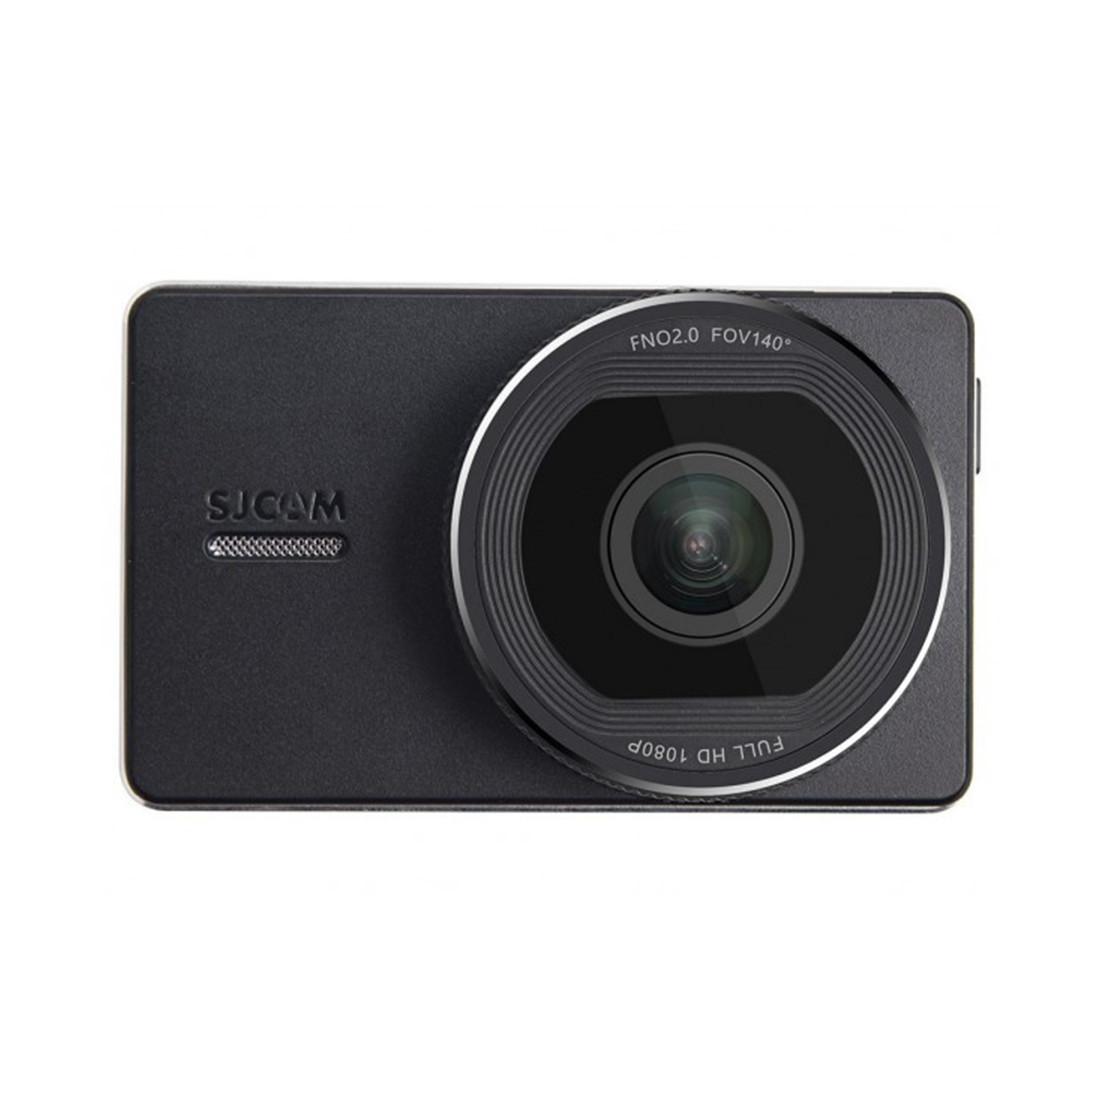 Экшн-камера SJCAM SJDASH (Black)